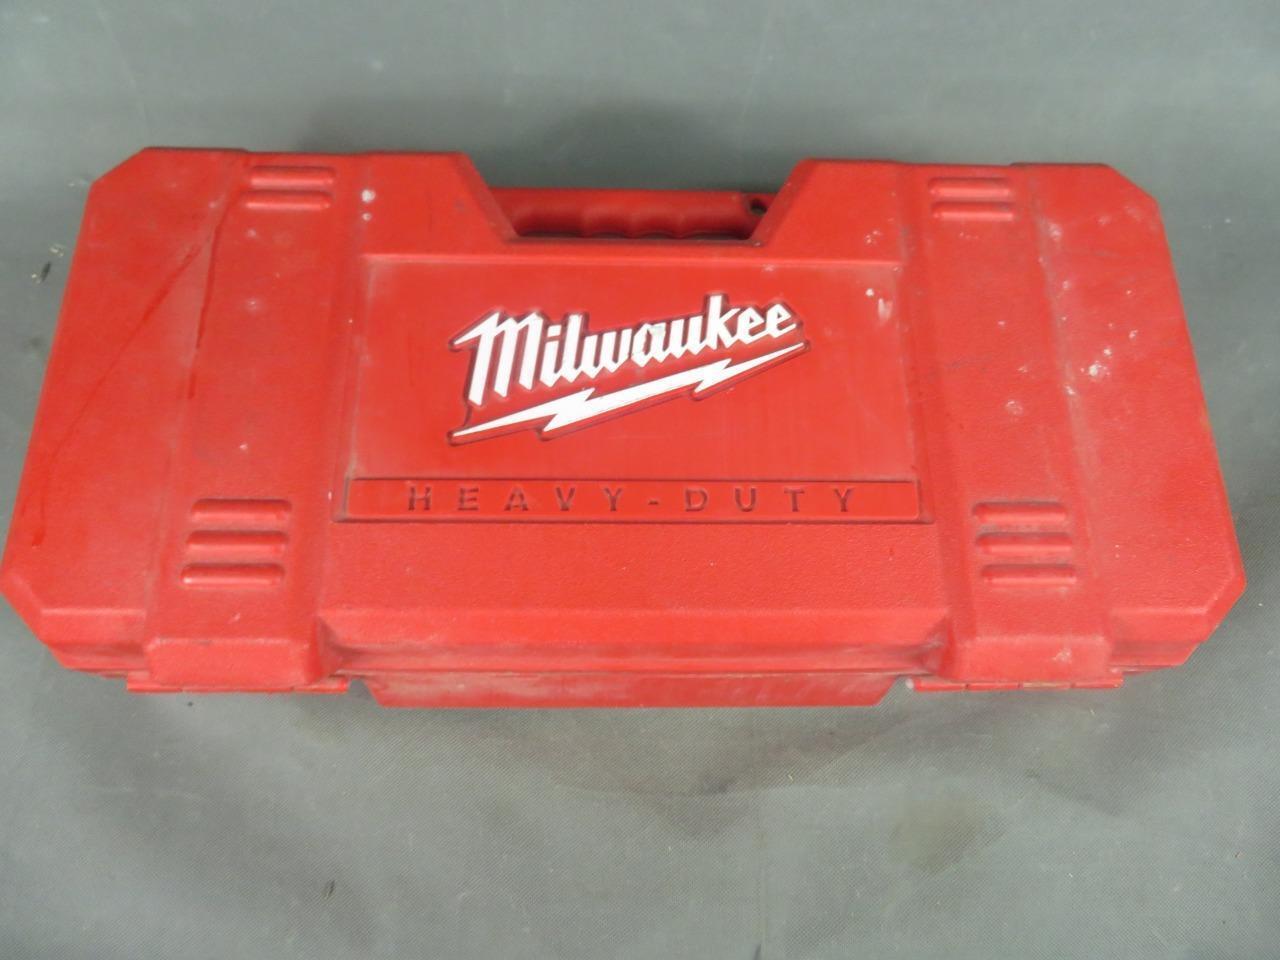 Milwaukee 6520-21 Orbital Sawzall Reciprocating Saw 120V 13A